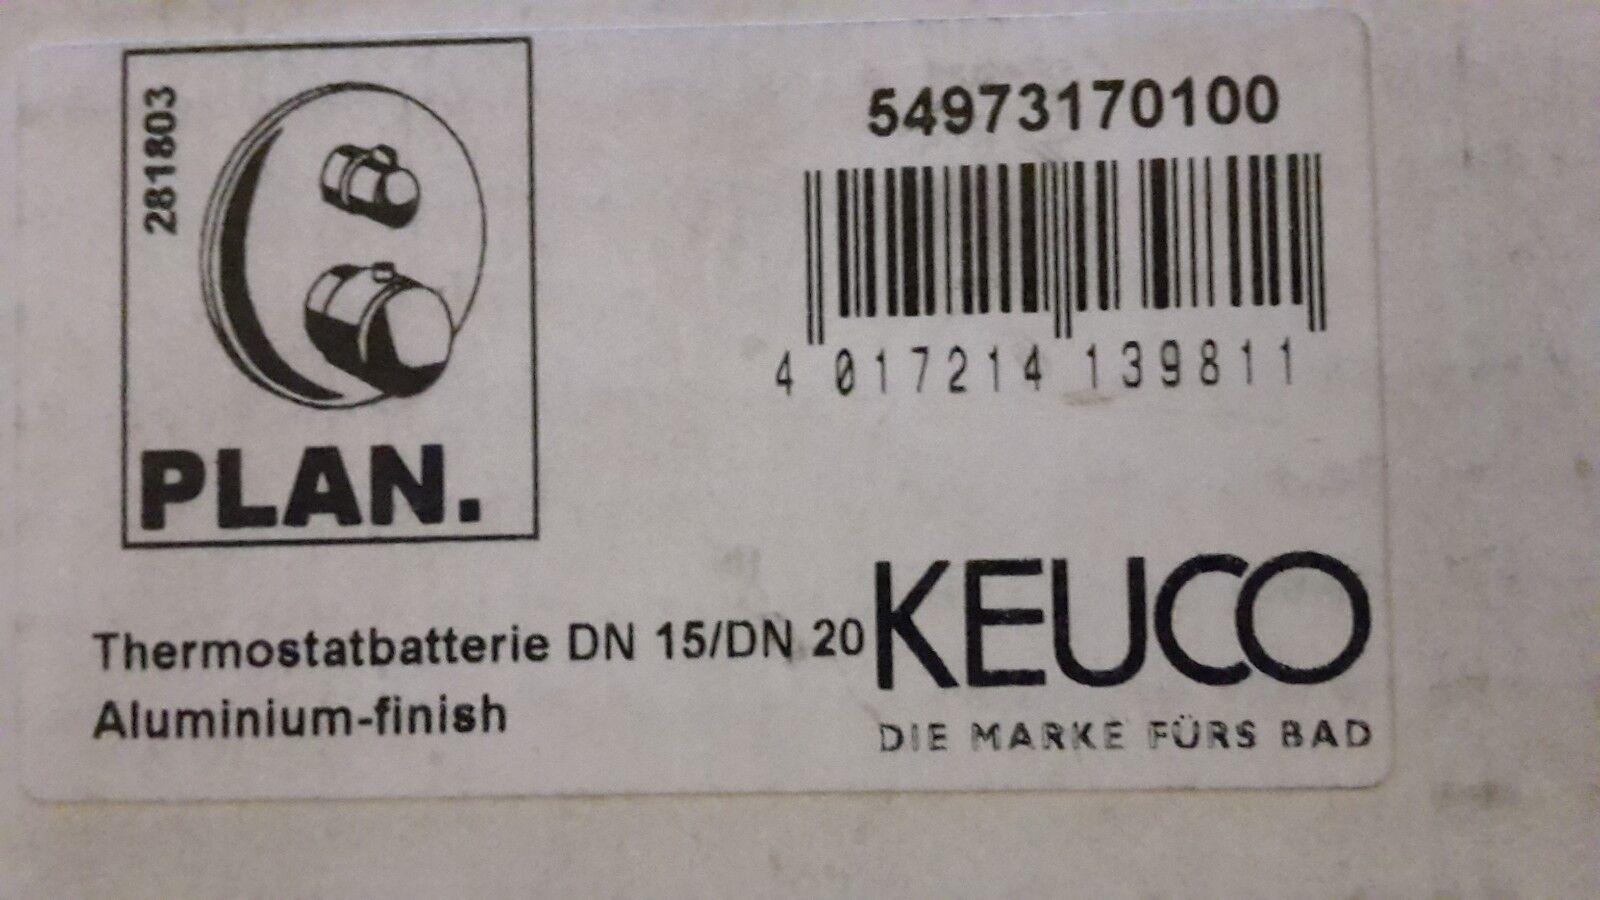 KEUCO Thermostatbatterie Plan DN15/DN20,m. Absperrventil, alu.finish 54973170100